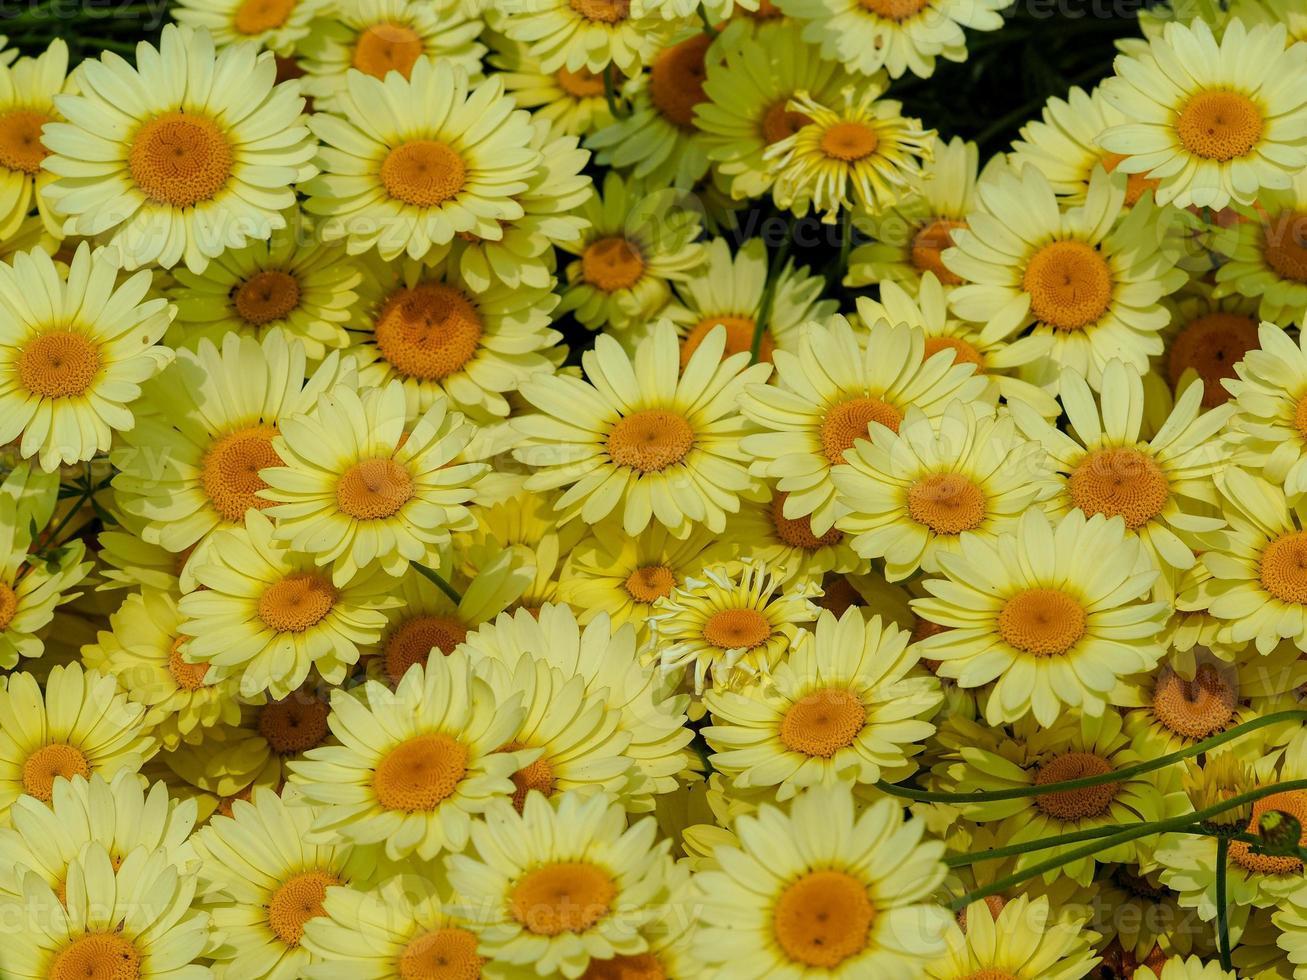 fiori gialli margherita foto